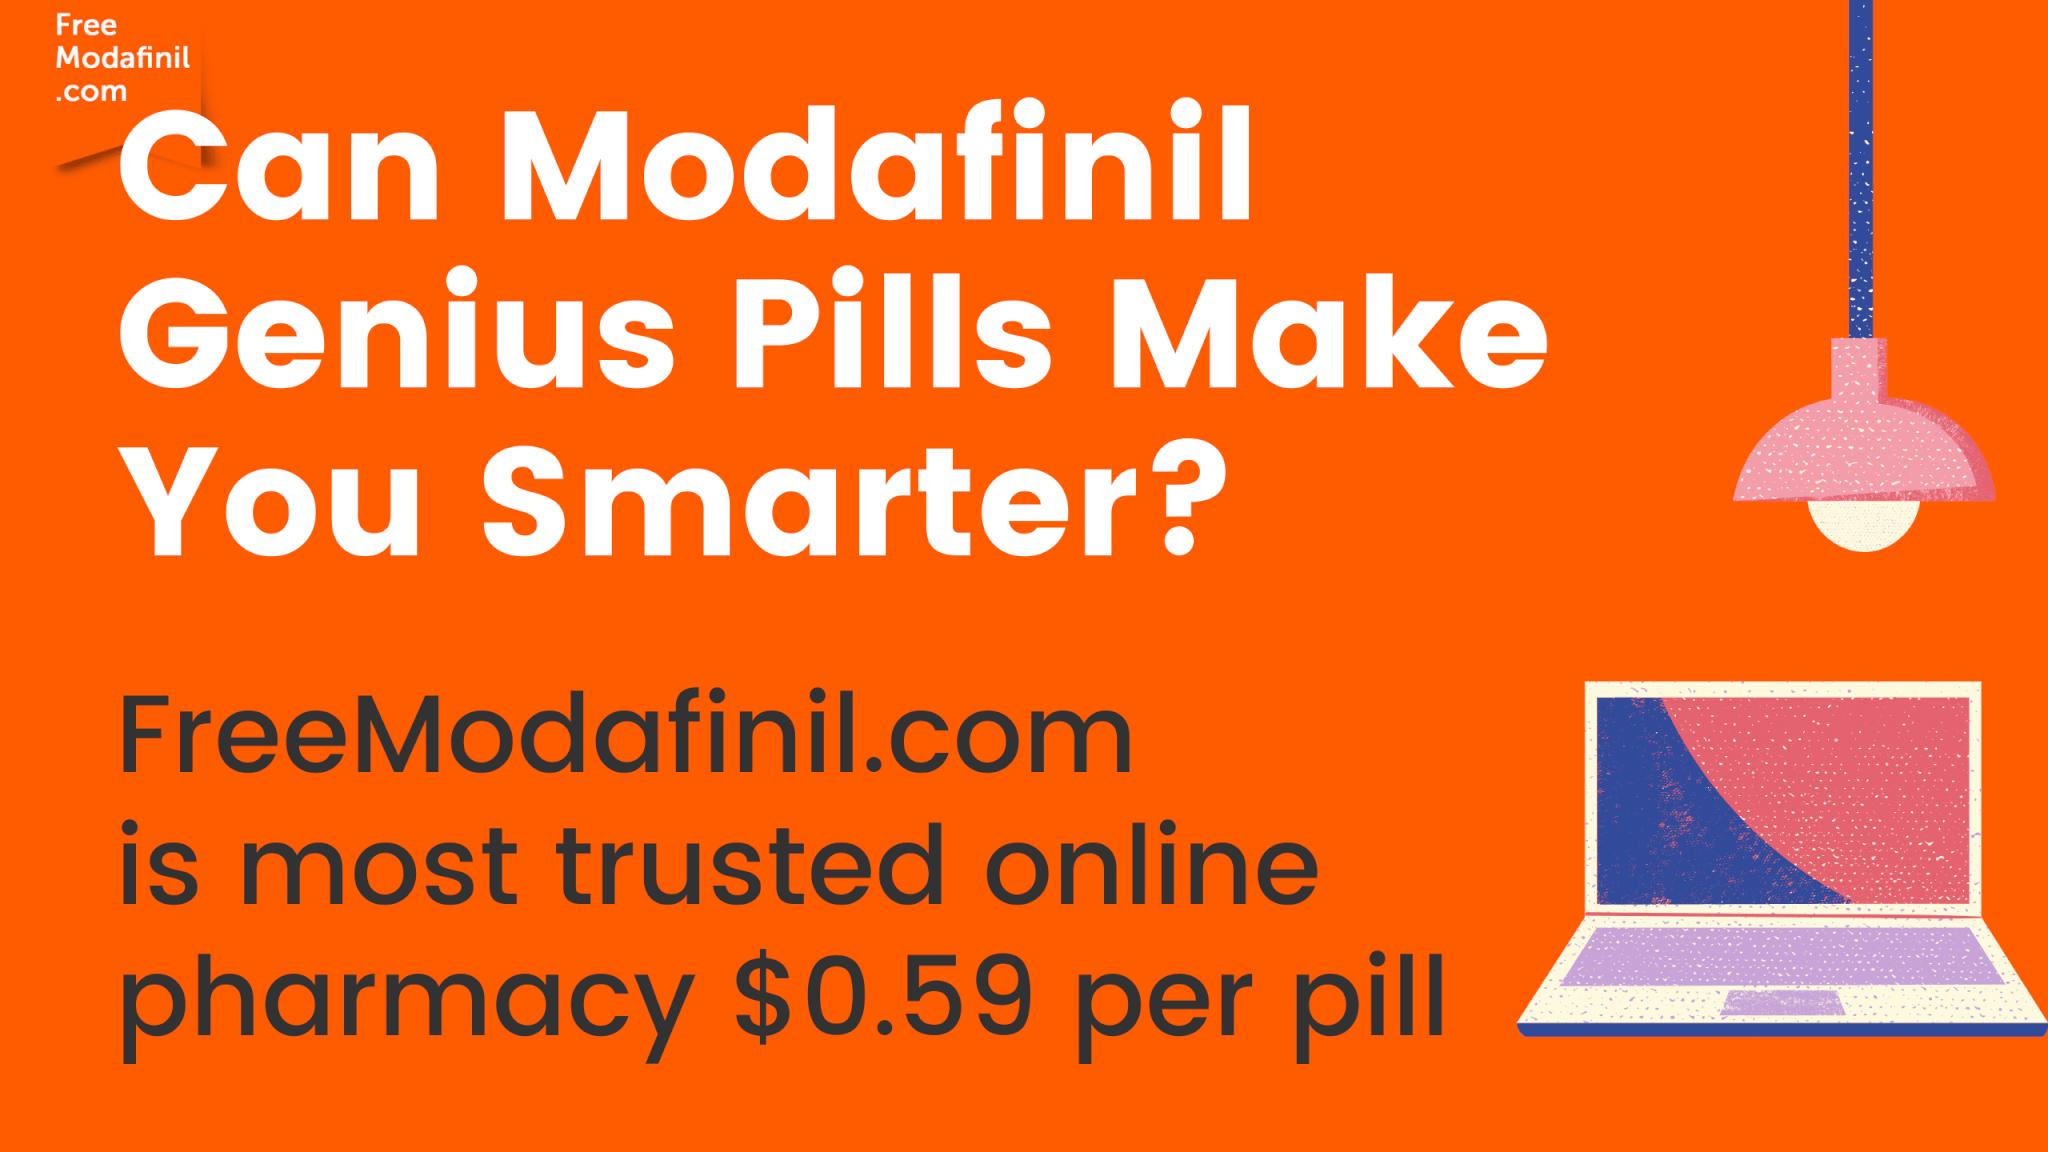 Can Modafinil Genius Pills Make You Smarter